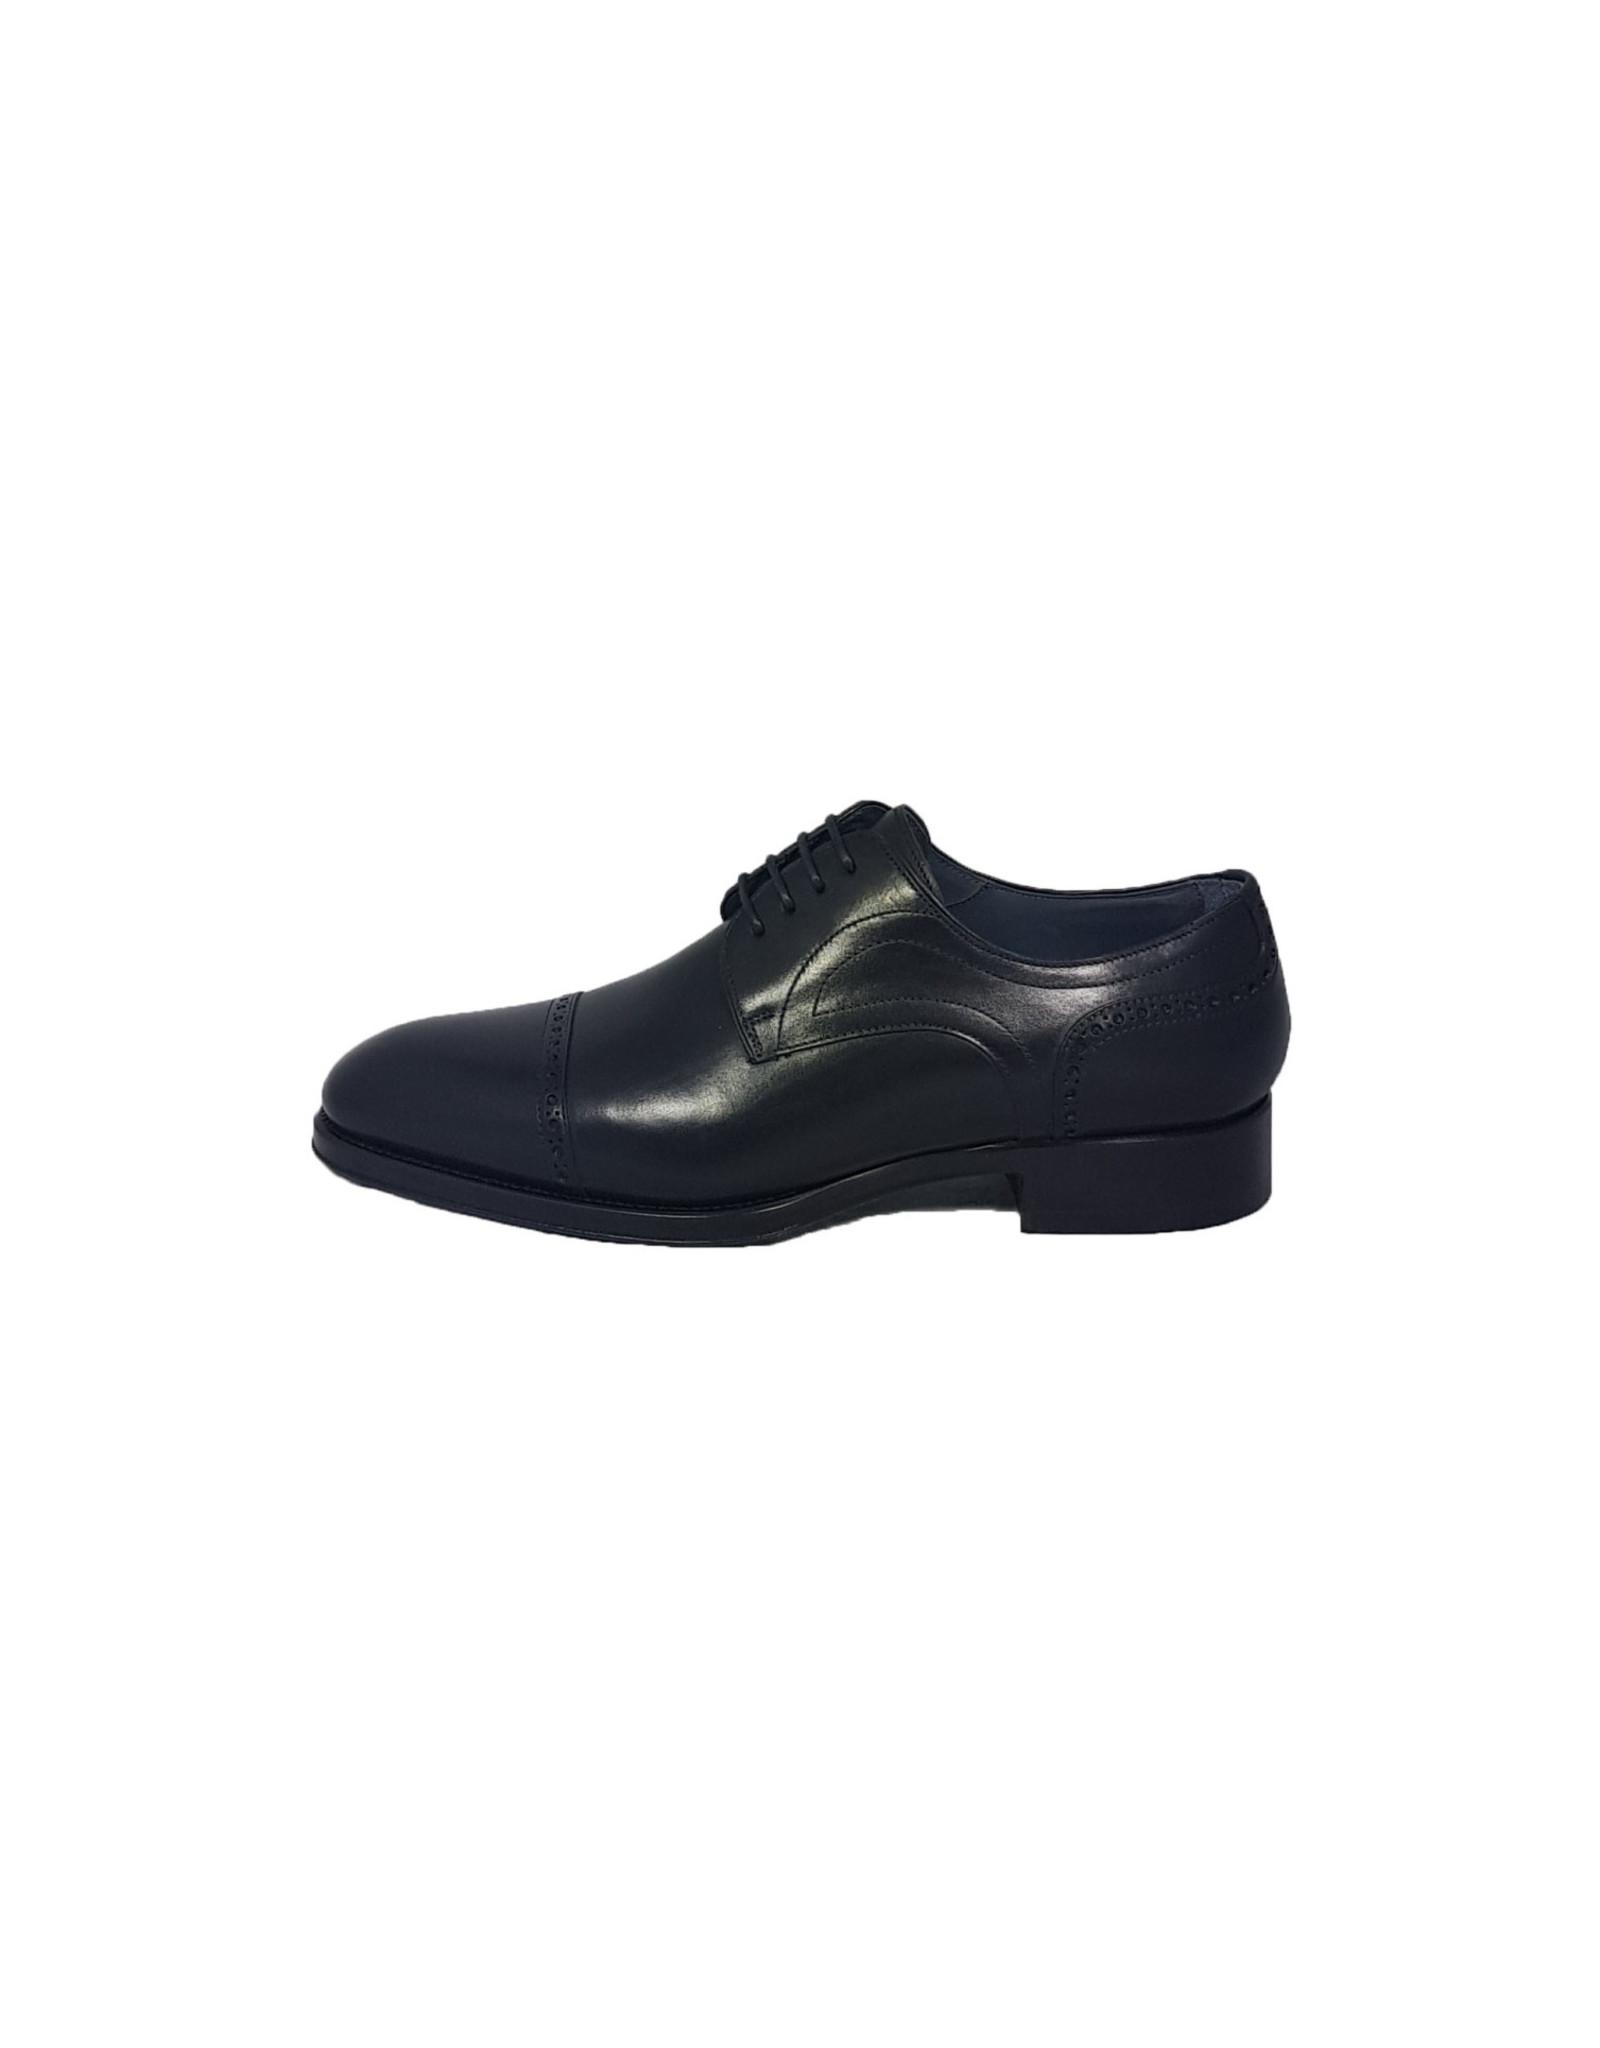 Zampiere Zampiere schoenen delave nero M:5404